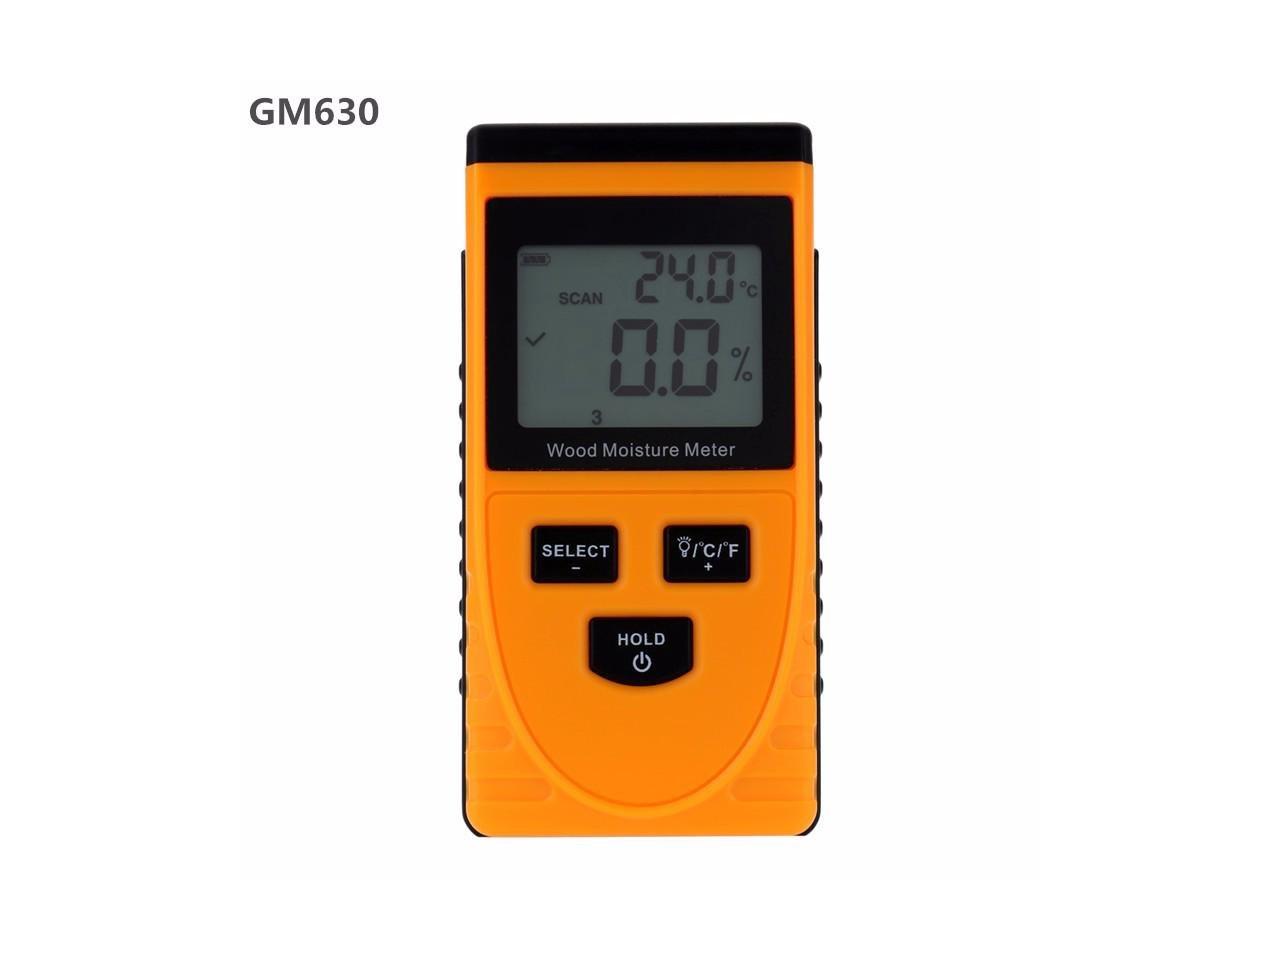 Tekit Professional Digital Wood Moisture Meter Temperature Humidity Tester Induction Moisture Tester LCD Display Hygrometer GM630